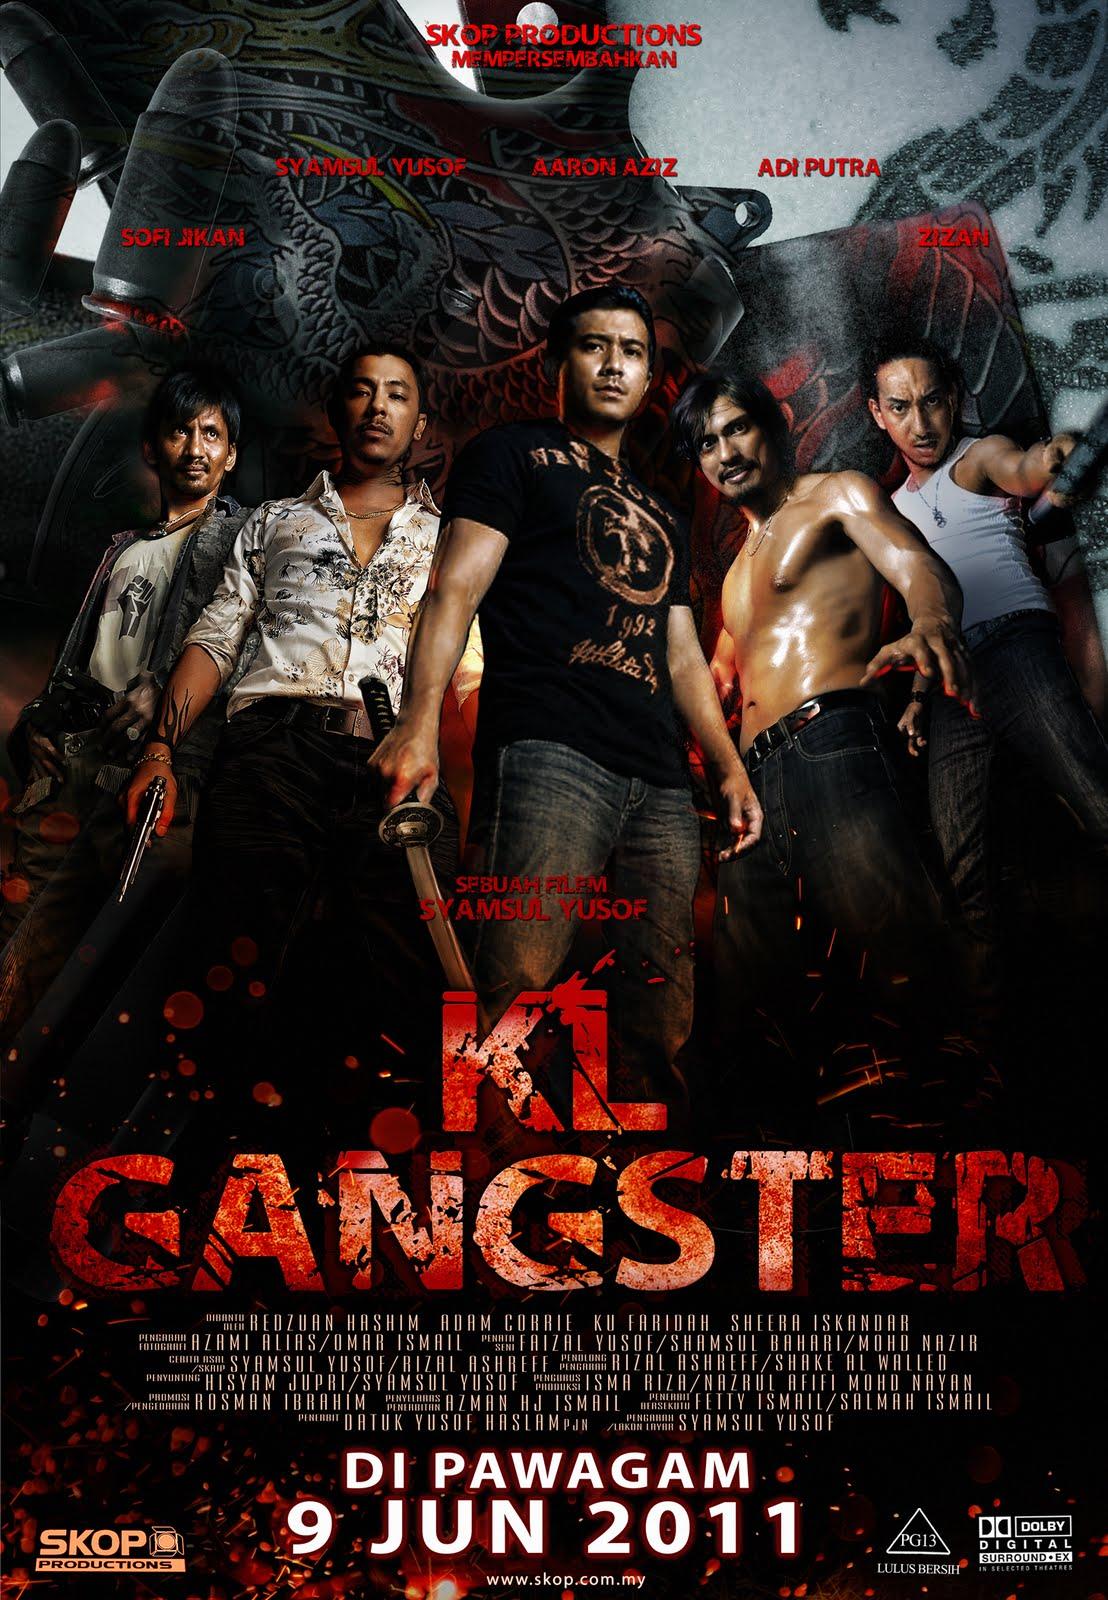 http://3.bp.blogspot.com/-2Sx88bQgtls/ThNdz0IhoDI/AAAAAAAABgk/4XCF_r0x-FI/s1600/KL_Gangster_2011.jpg